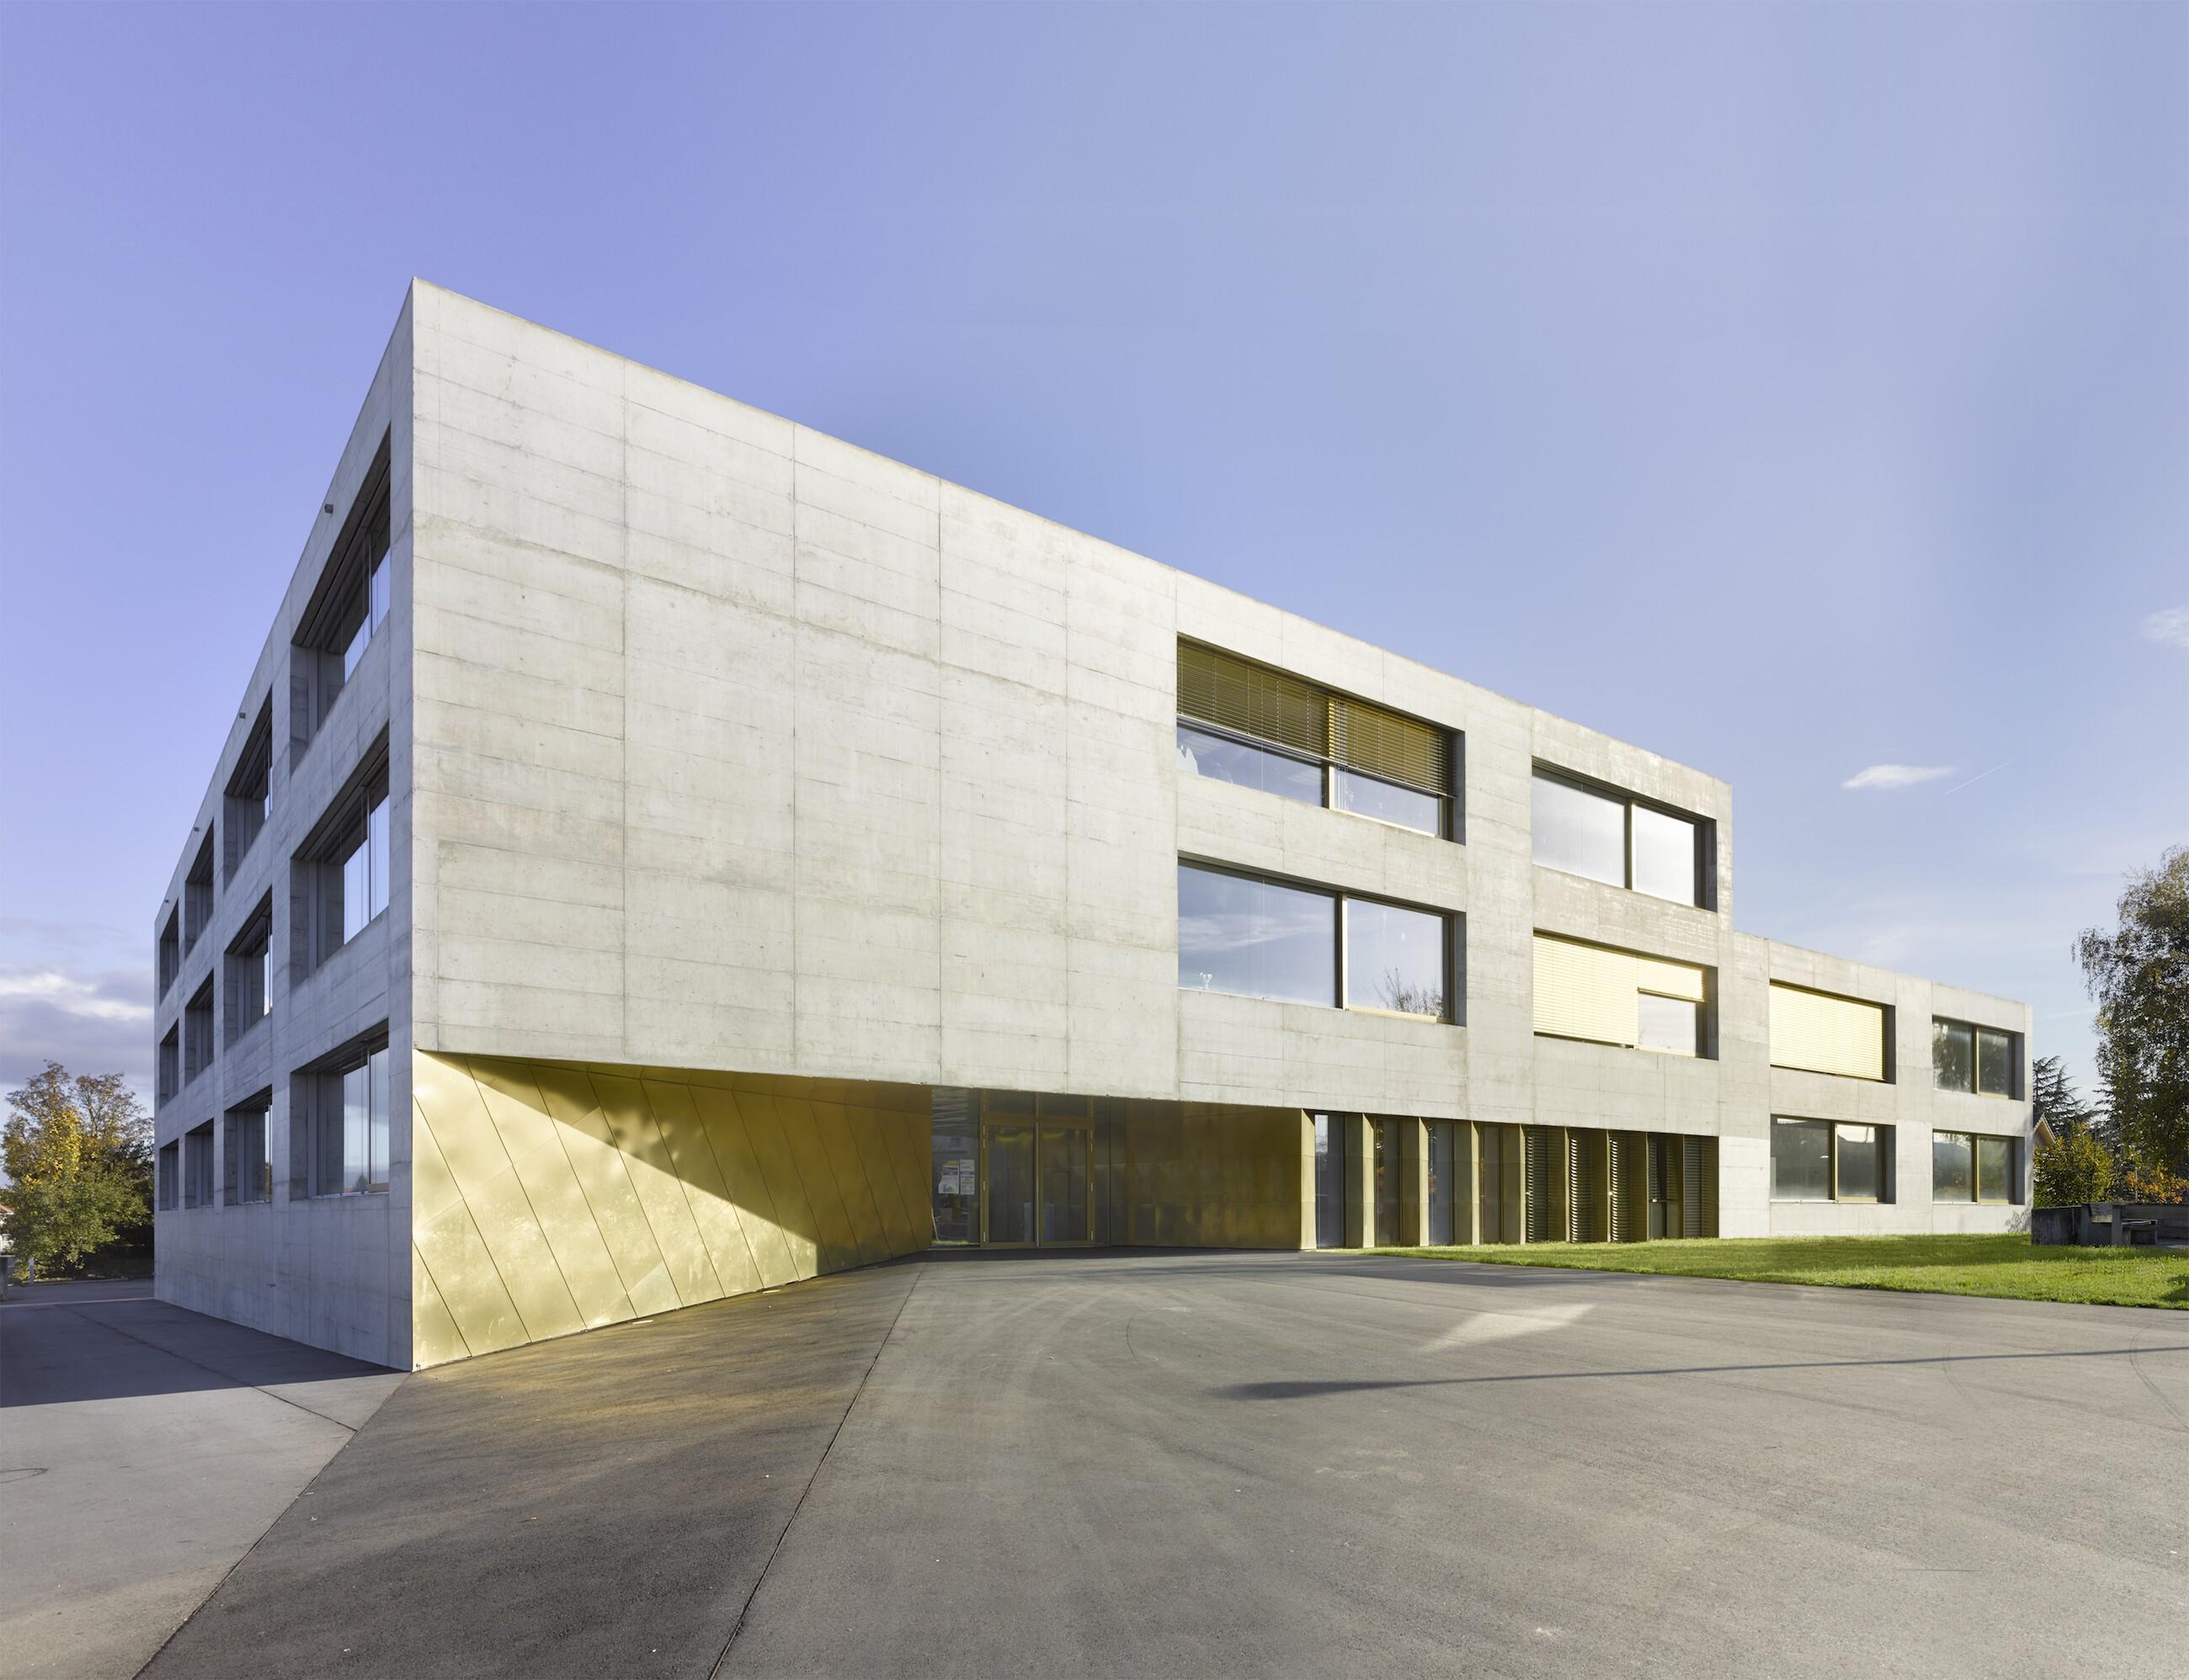 Morscher Architects